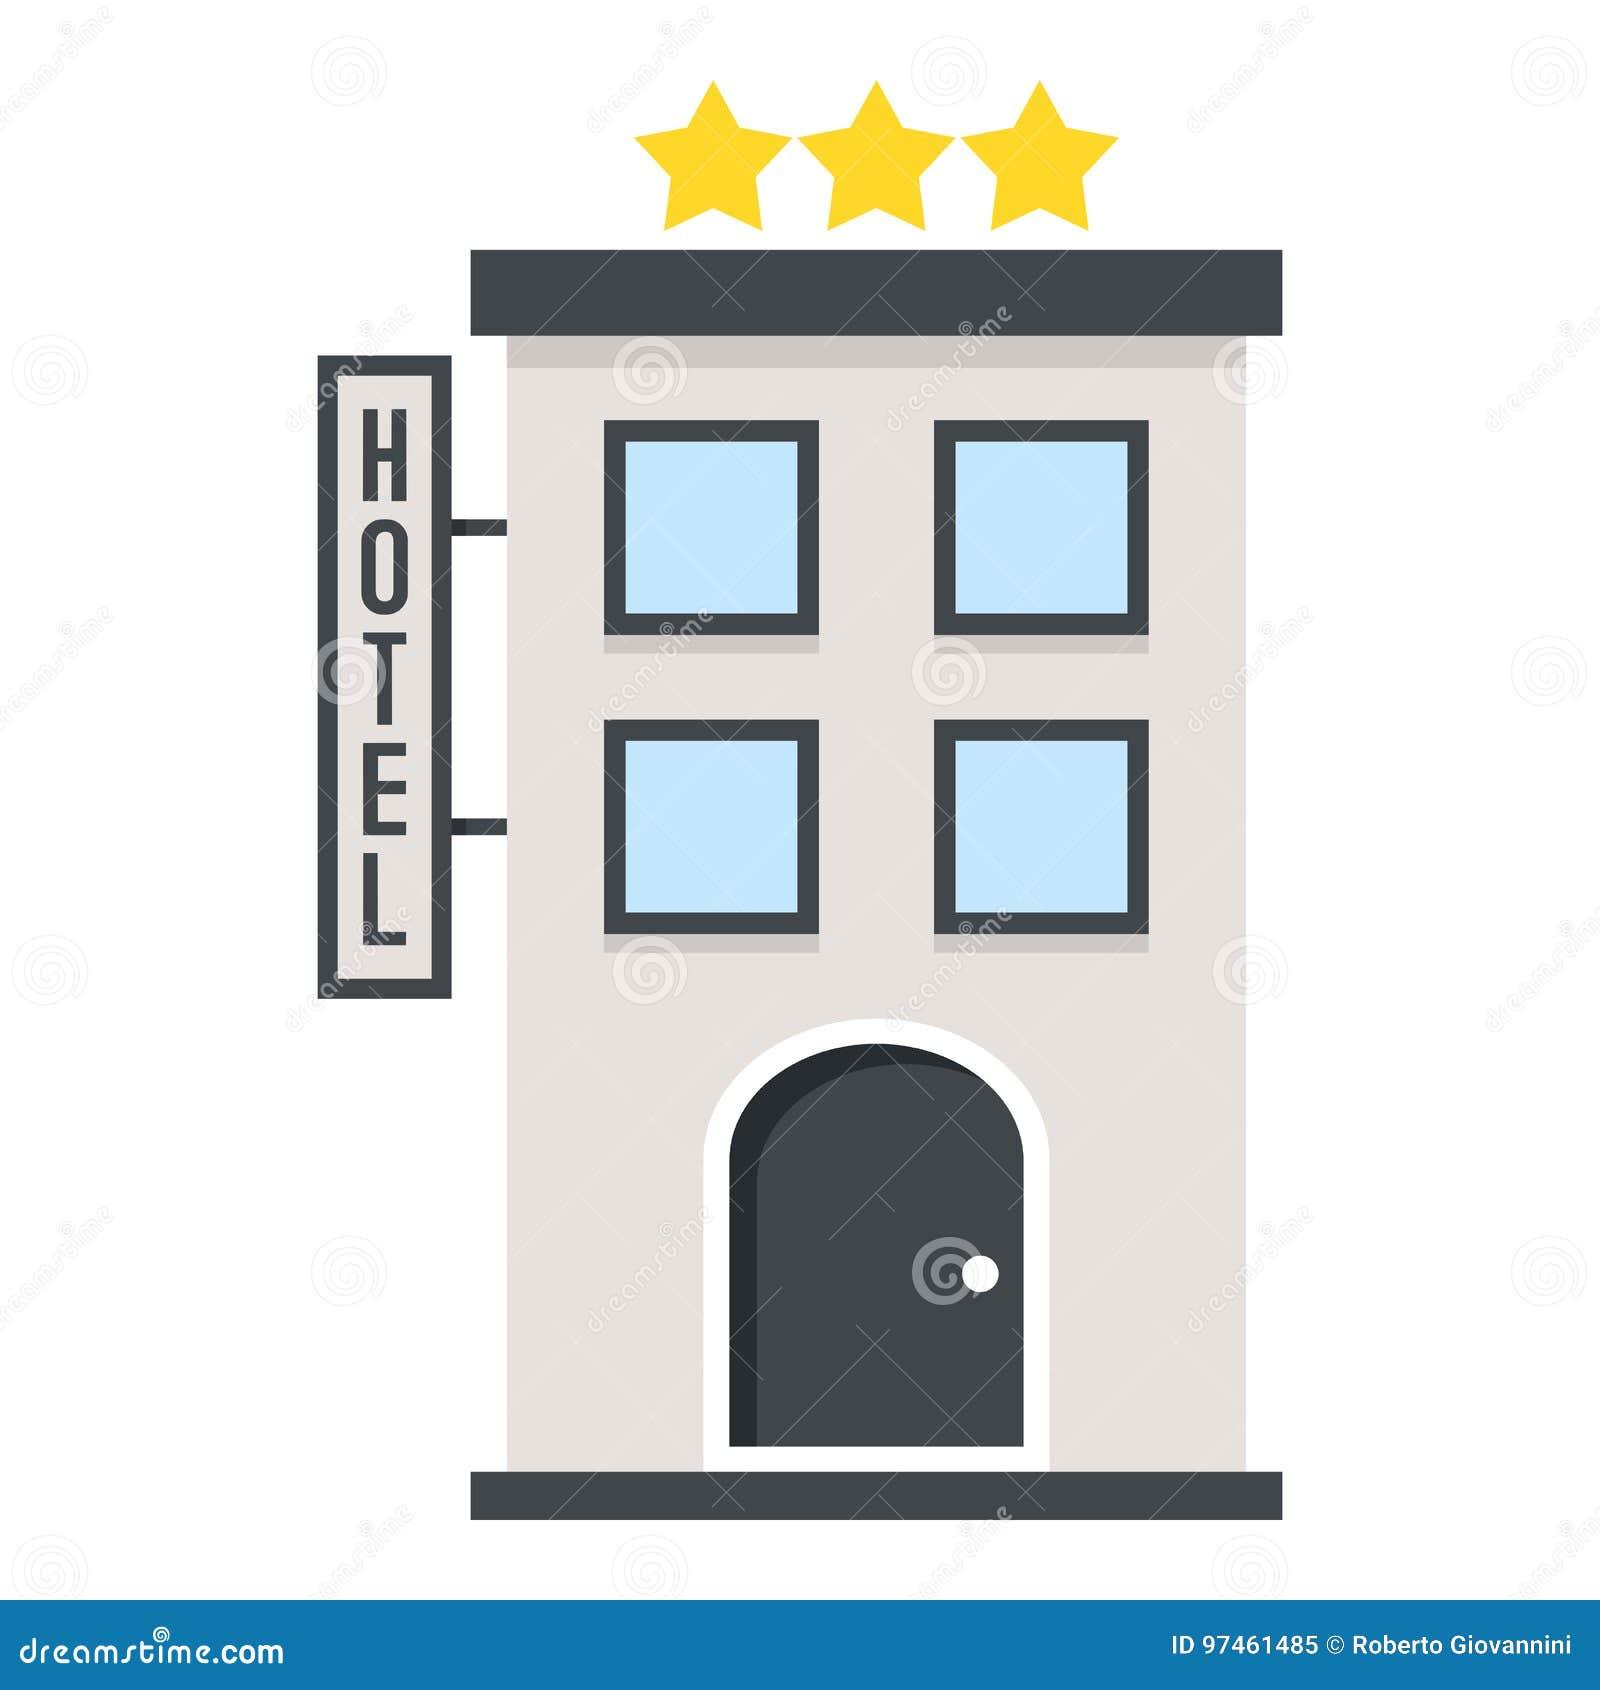 Three Stars Hotel Flat Icon Isolated on White